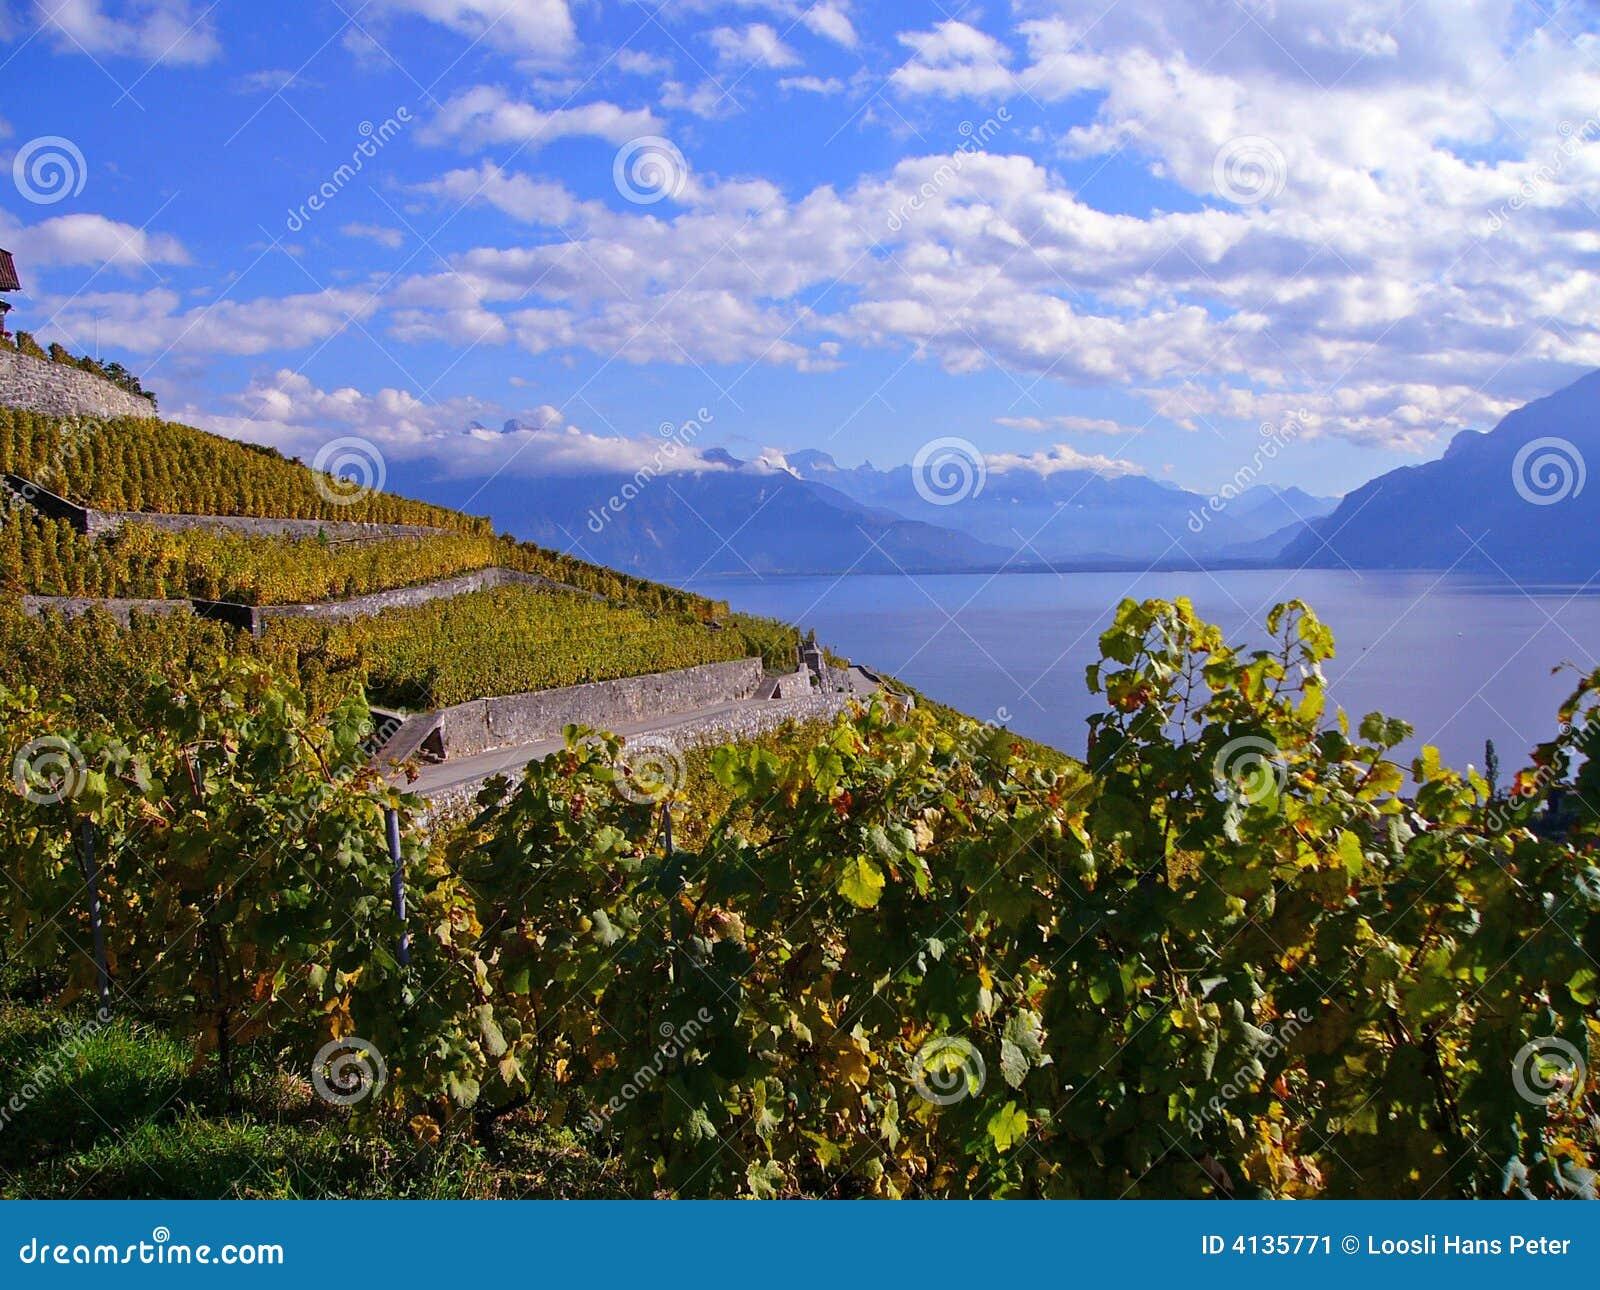 Vineyards in Automn